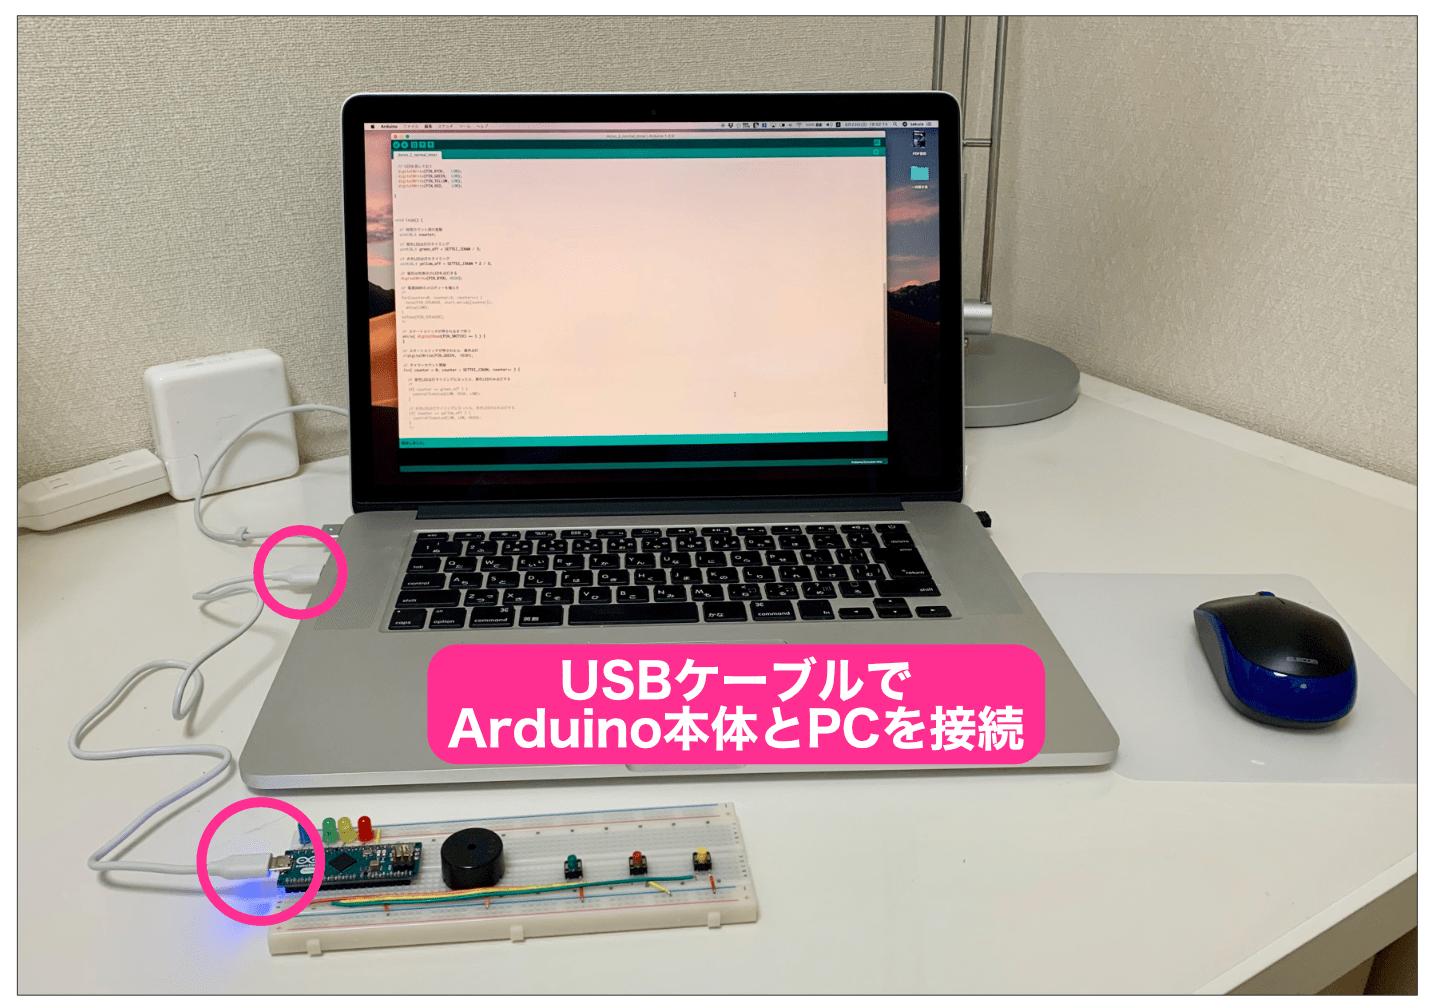 Arduinoプログラム書き込み